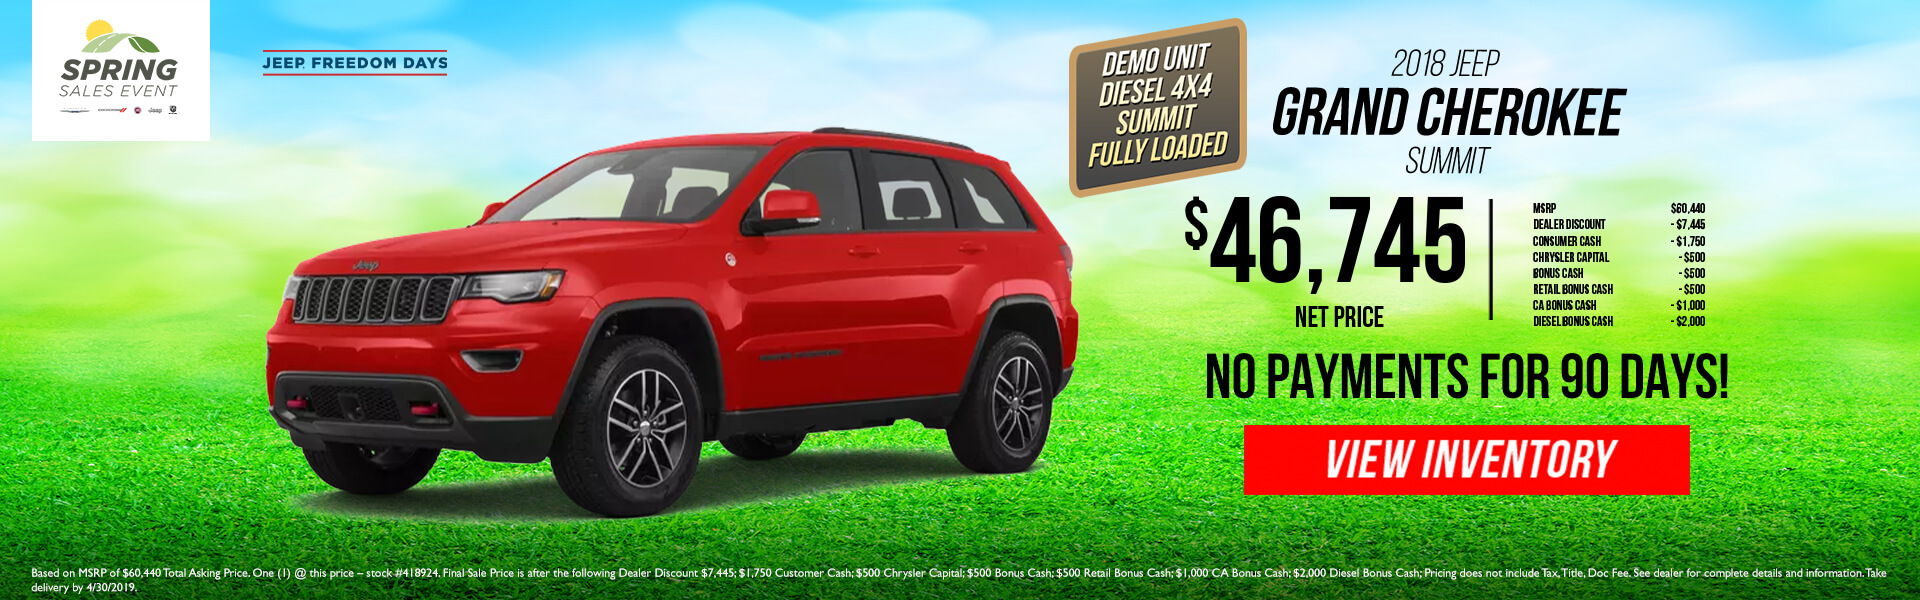 Jeep Grand Cherokee Summit 418924